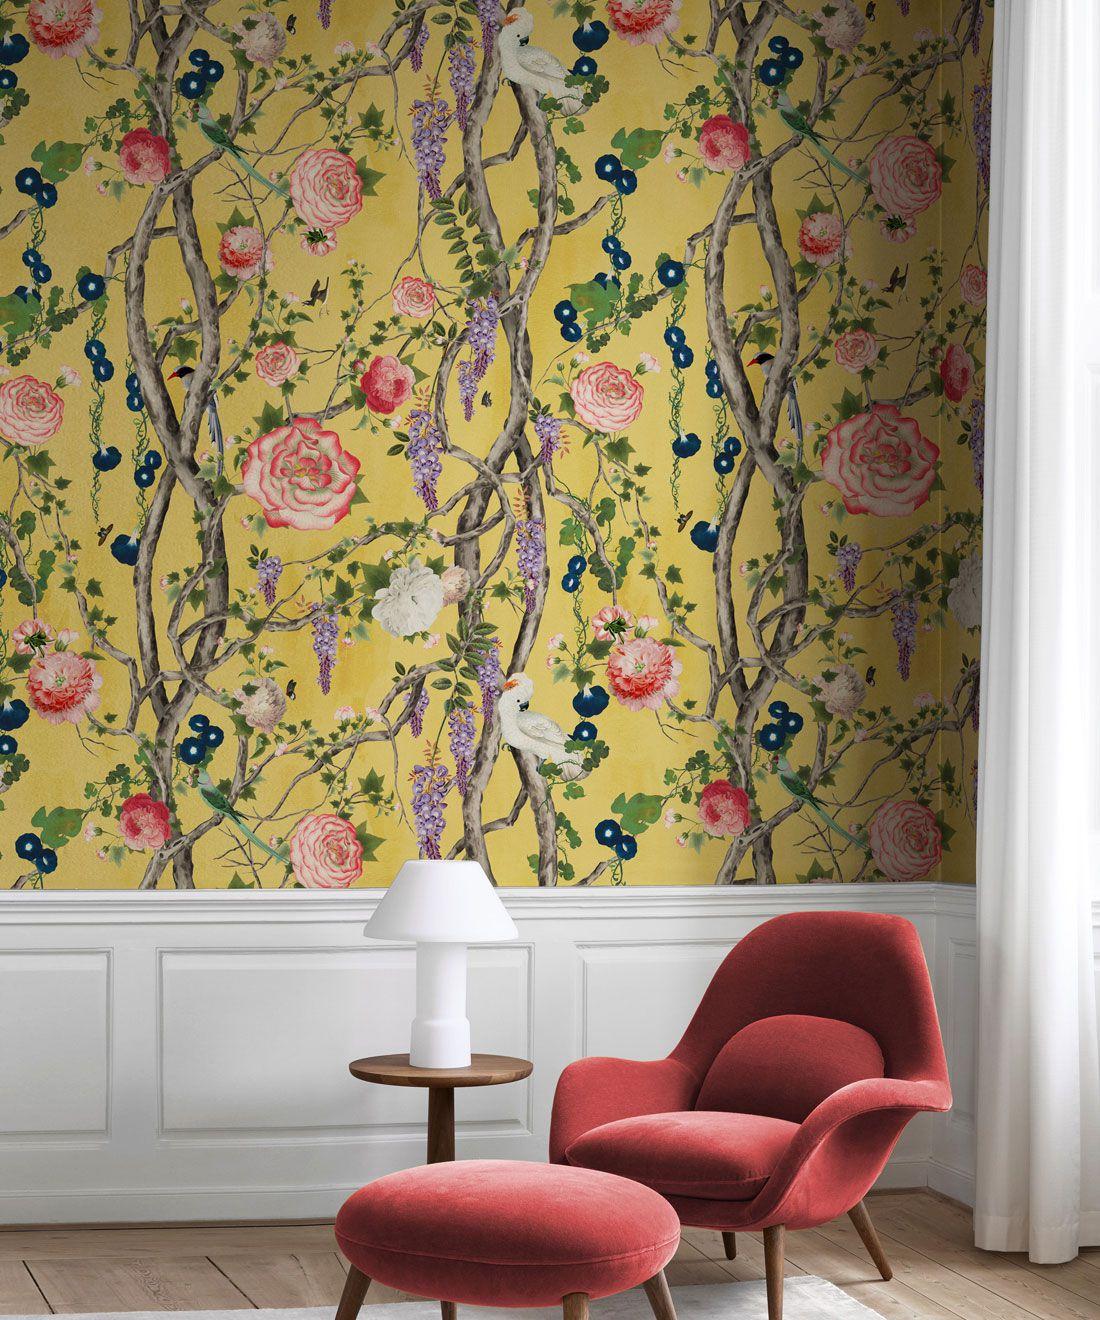 Empress Wallpaper • Romantic Wallpaper • Floral Wallpaper • Chinoiserie Wallpaper • Honey Yellow colour wallpaper insitu